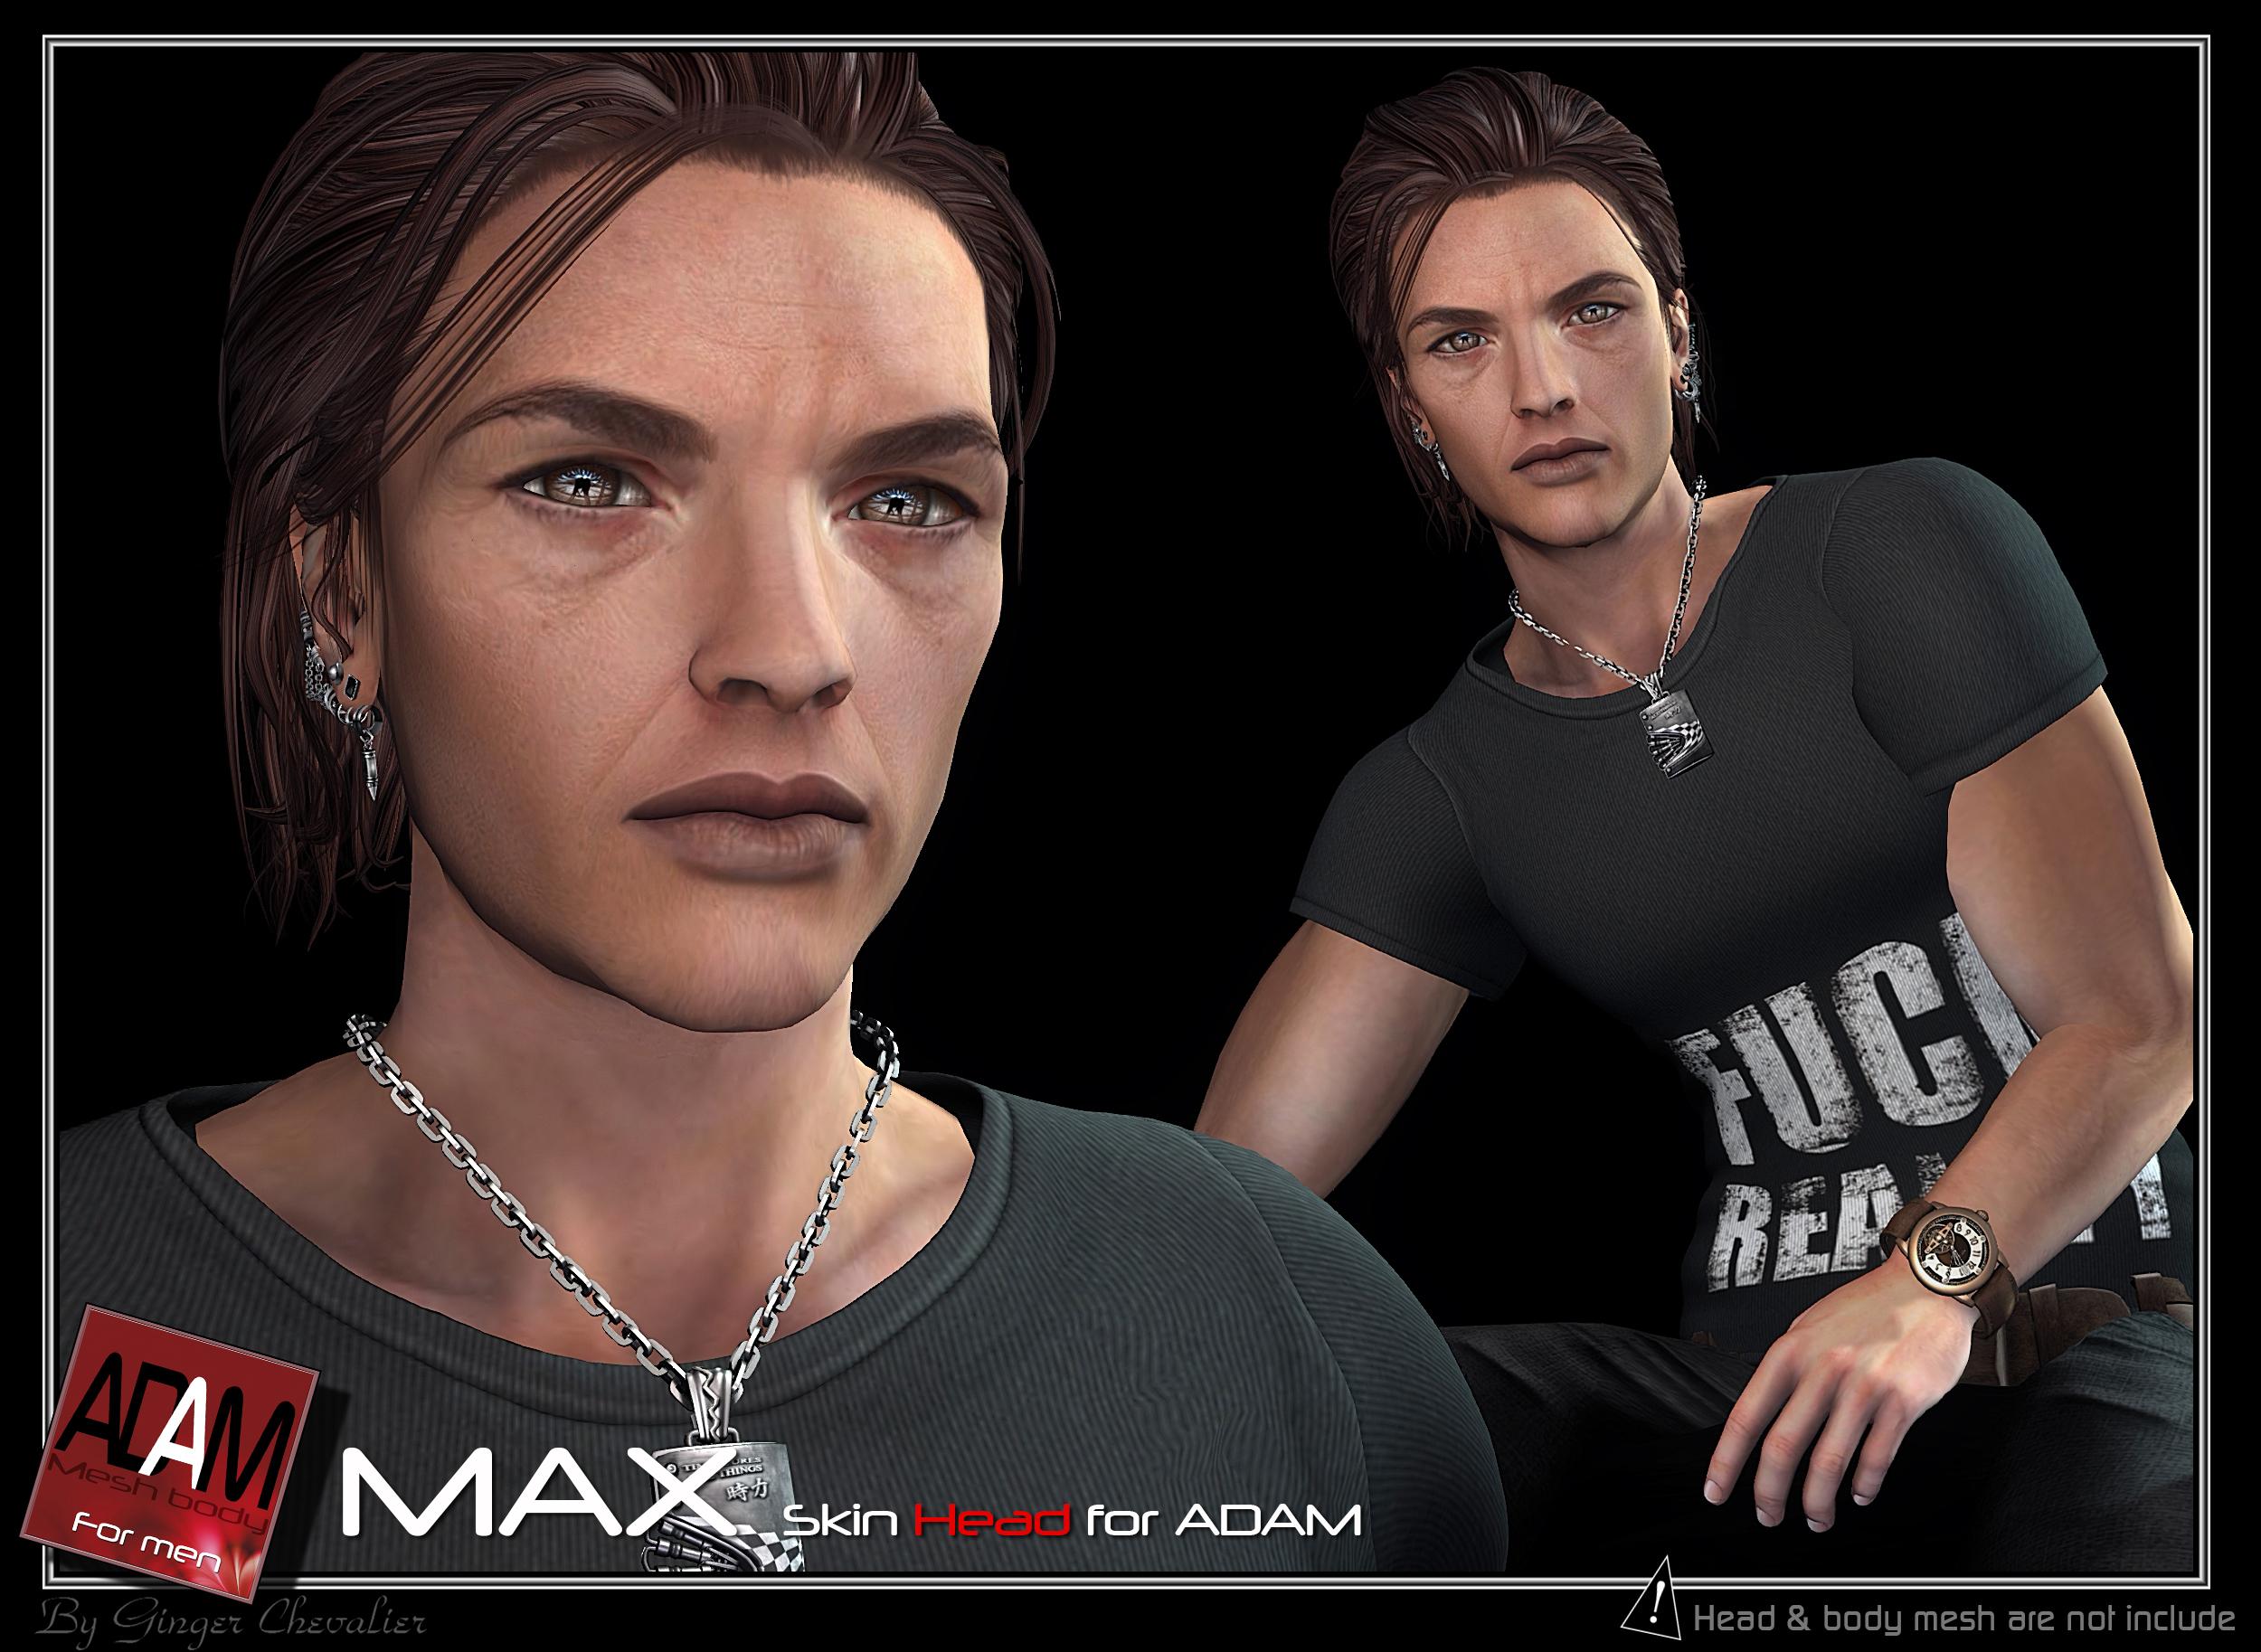 New Skins for ADAM | EVE & ADAM